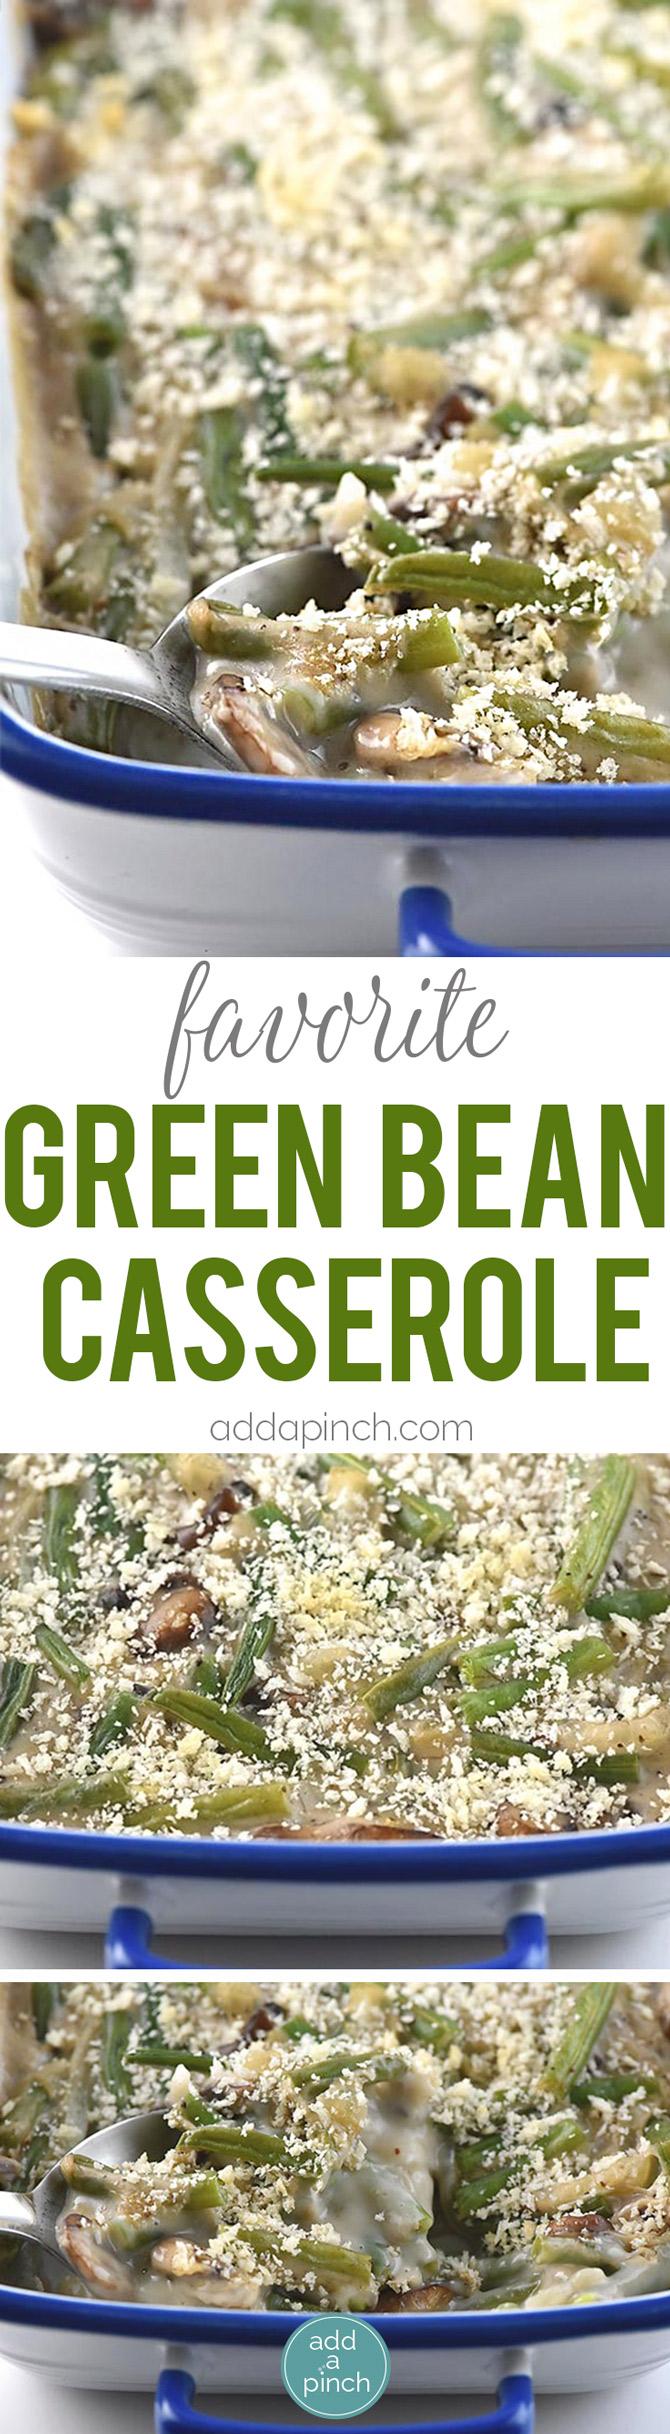 Easy Green Bean Casserole - A fresh take on classic green bean casserole! The easiest, creamiest green bean casserole ever. // addapinch.com